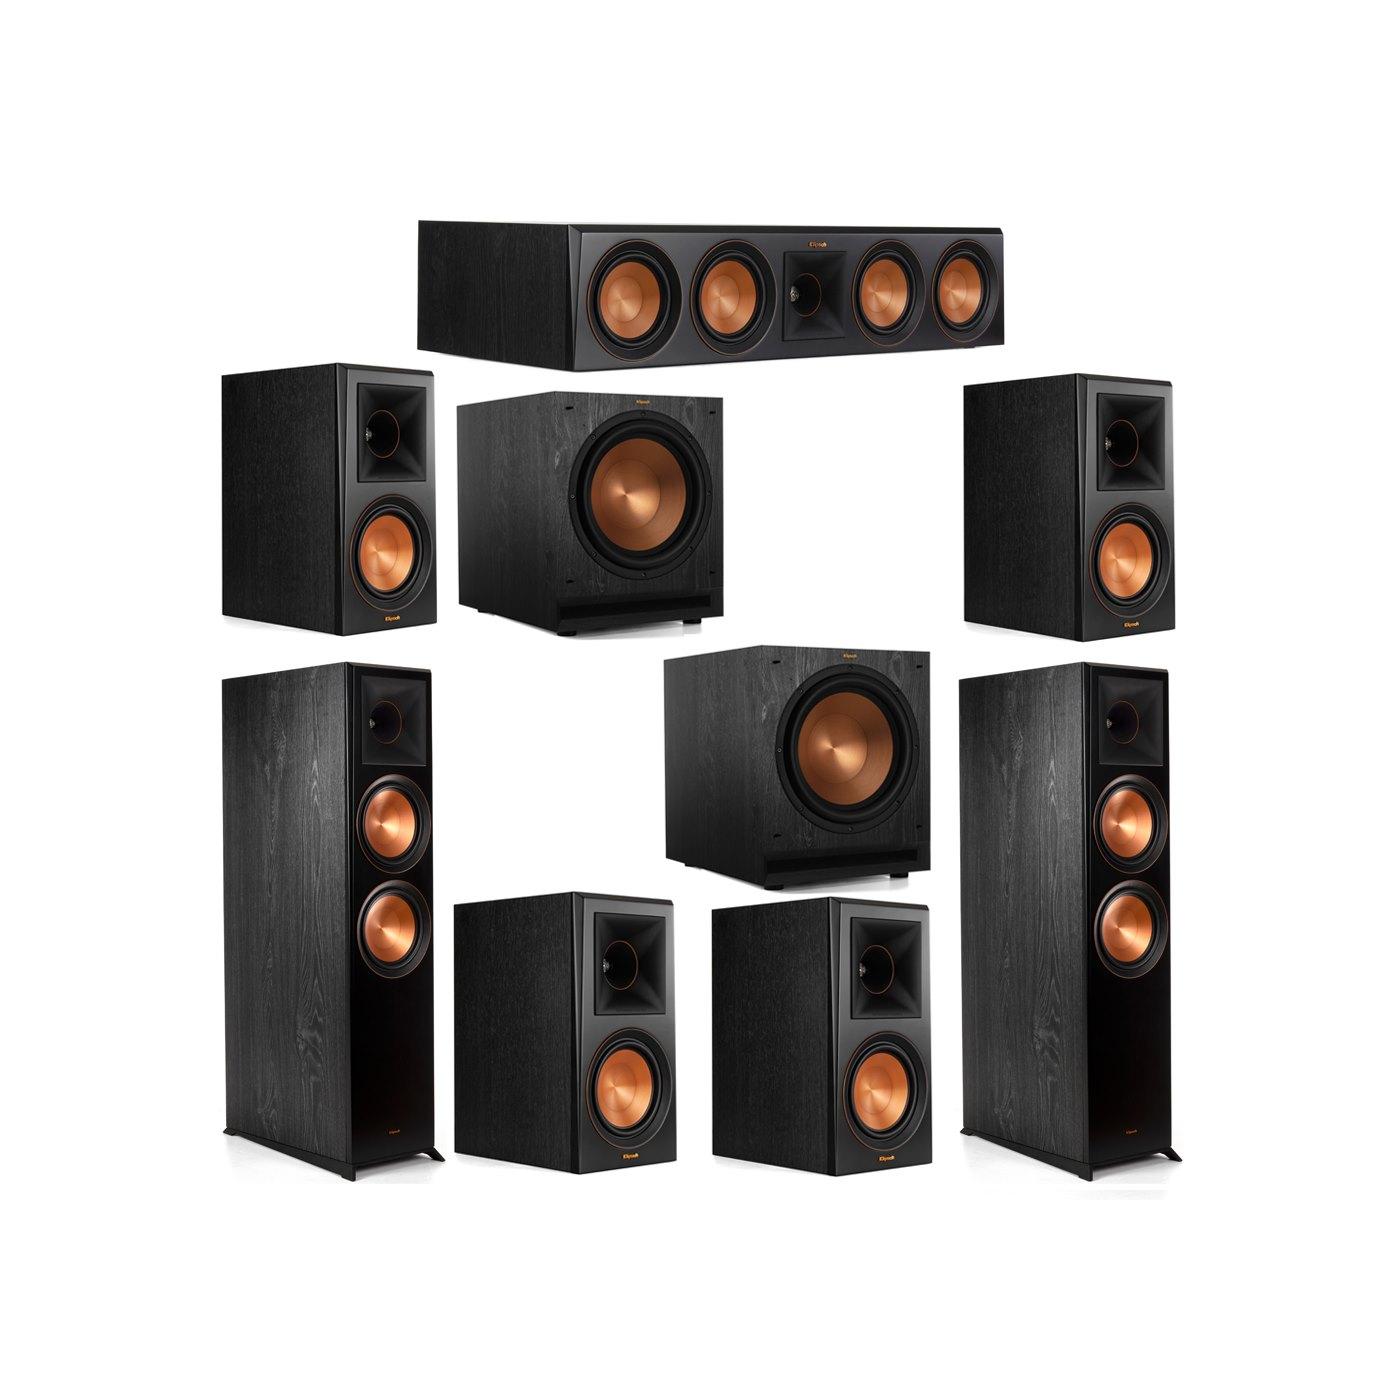 Klipsch 7.2 System with 2 RP-8000F Floorstanding Speakers, 1 Klipsch RP-504C Center Speaker, 4 Klipsch RP-600M Surround Speakers, 2 Klipsch SPL-120 Subwoofers